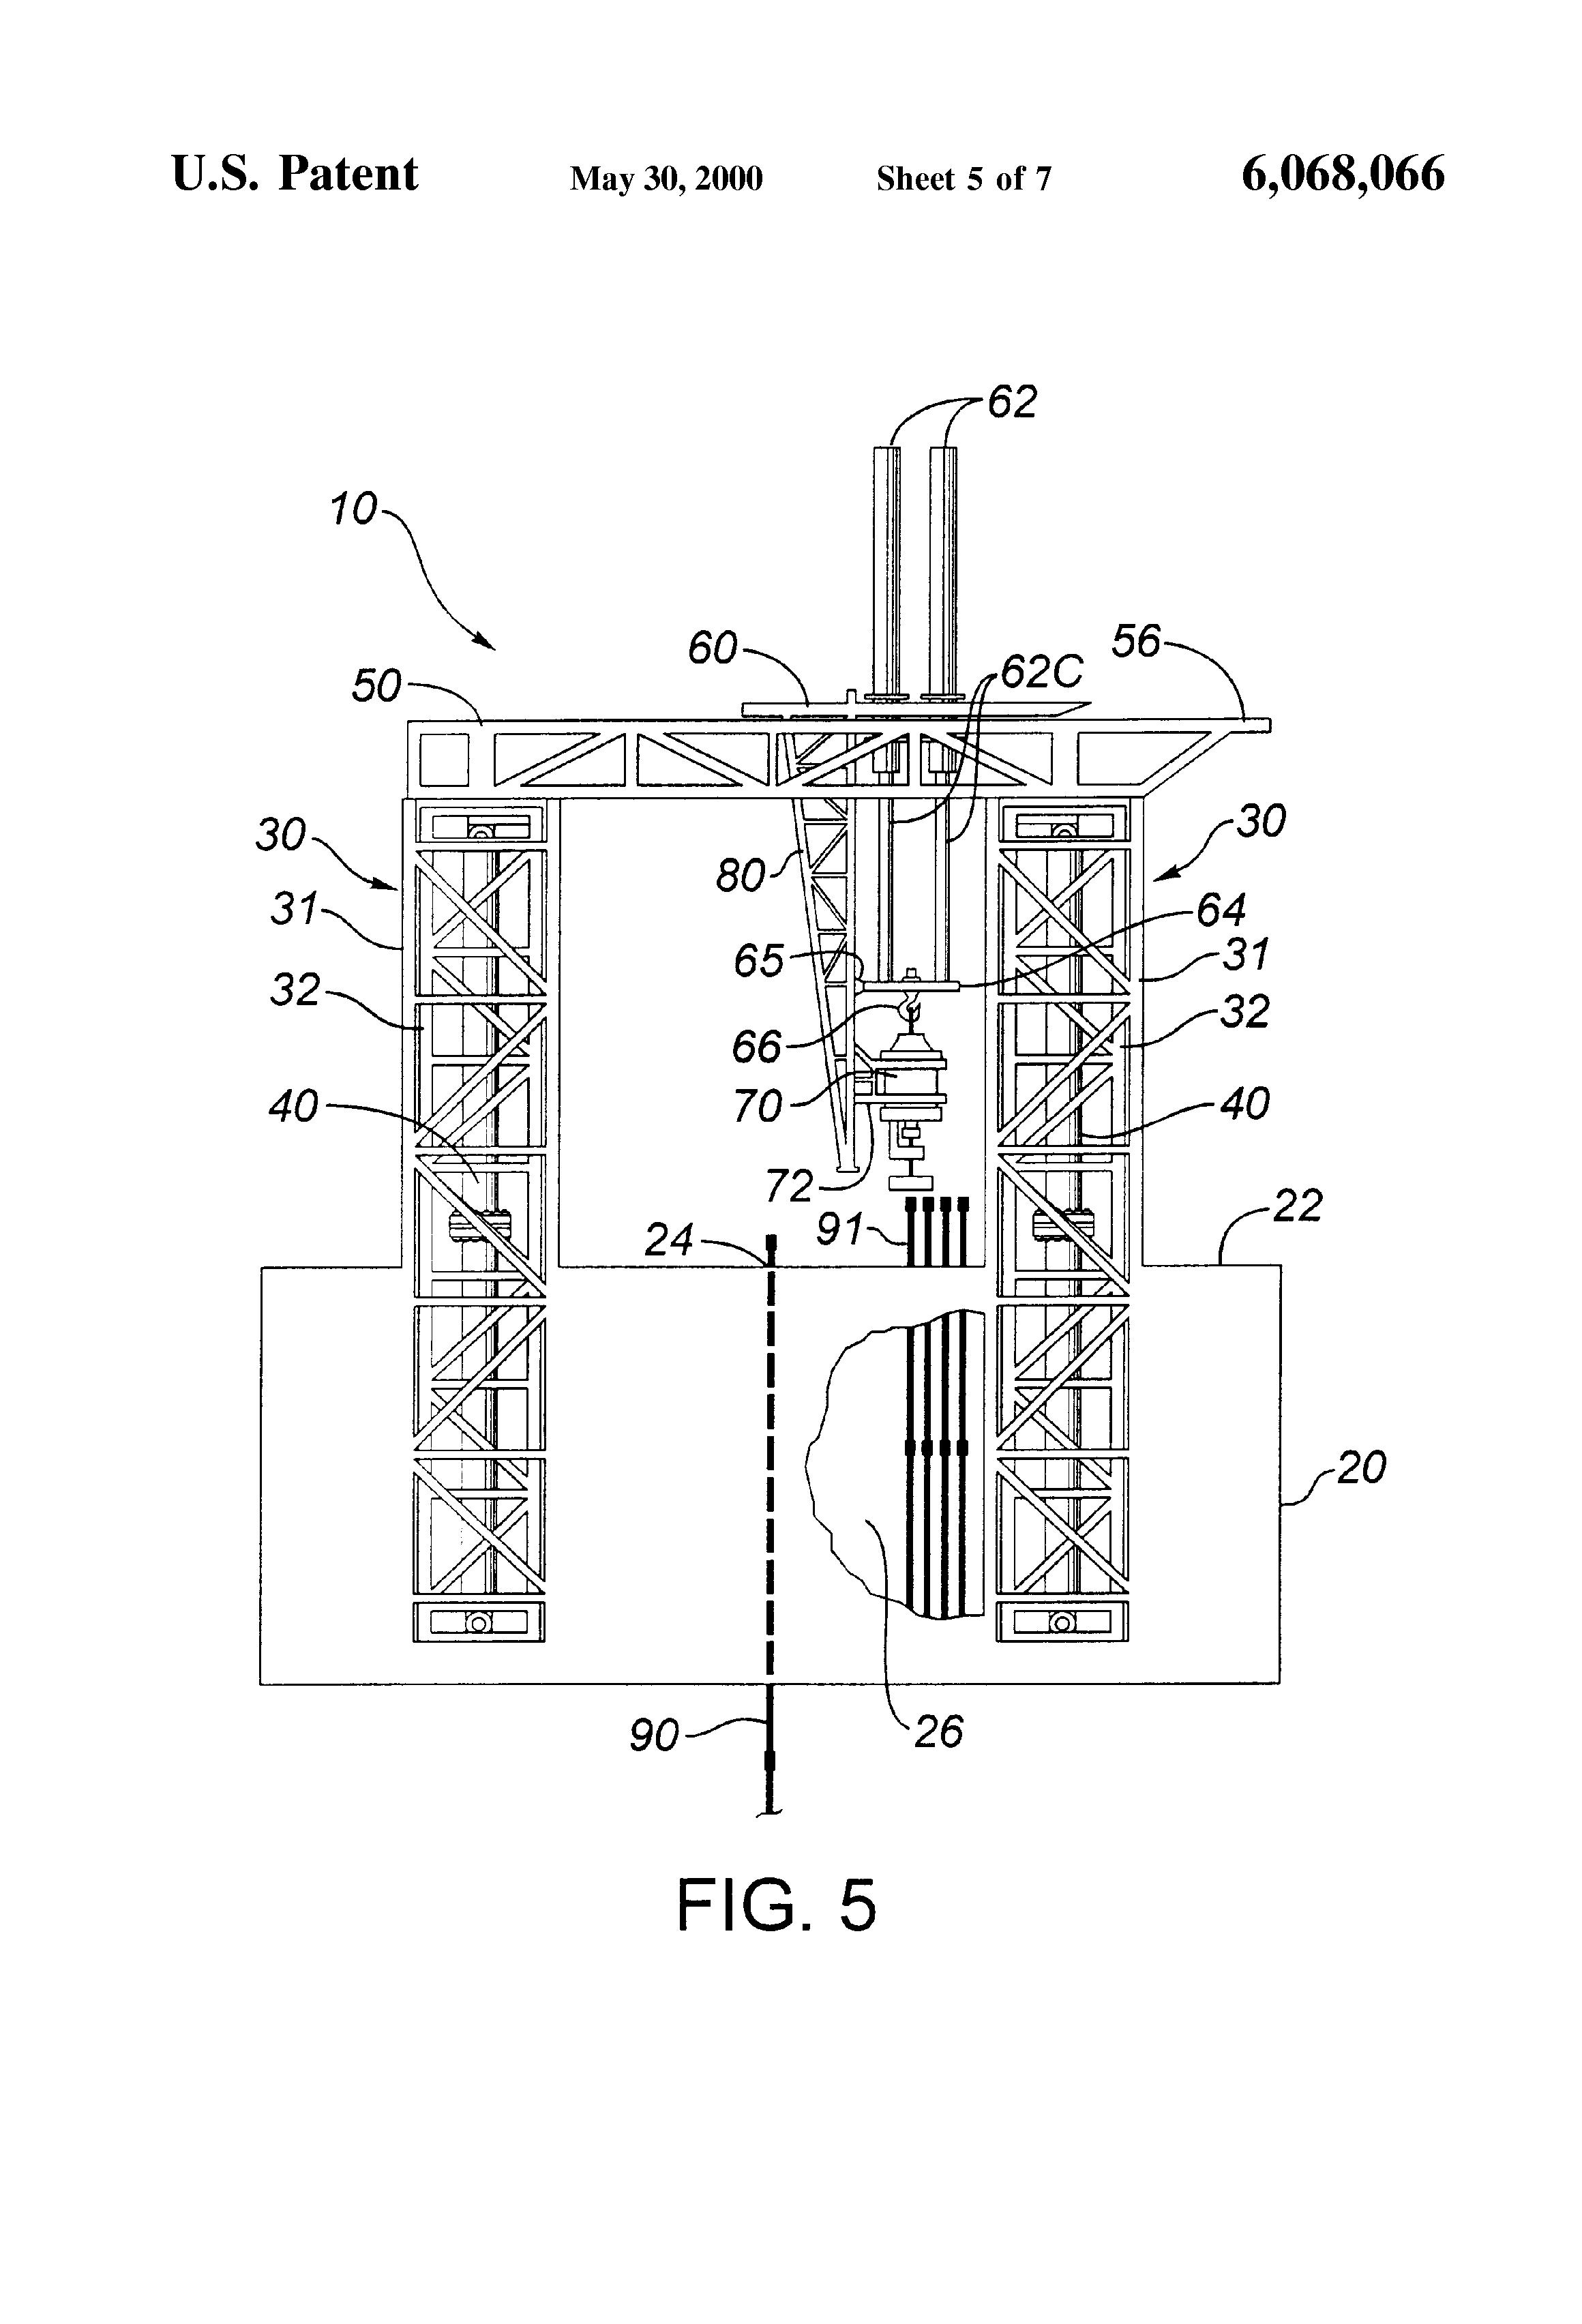 Rig Floor Elevation : Patent us hydraulic drilling rig google patenten